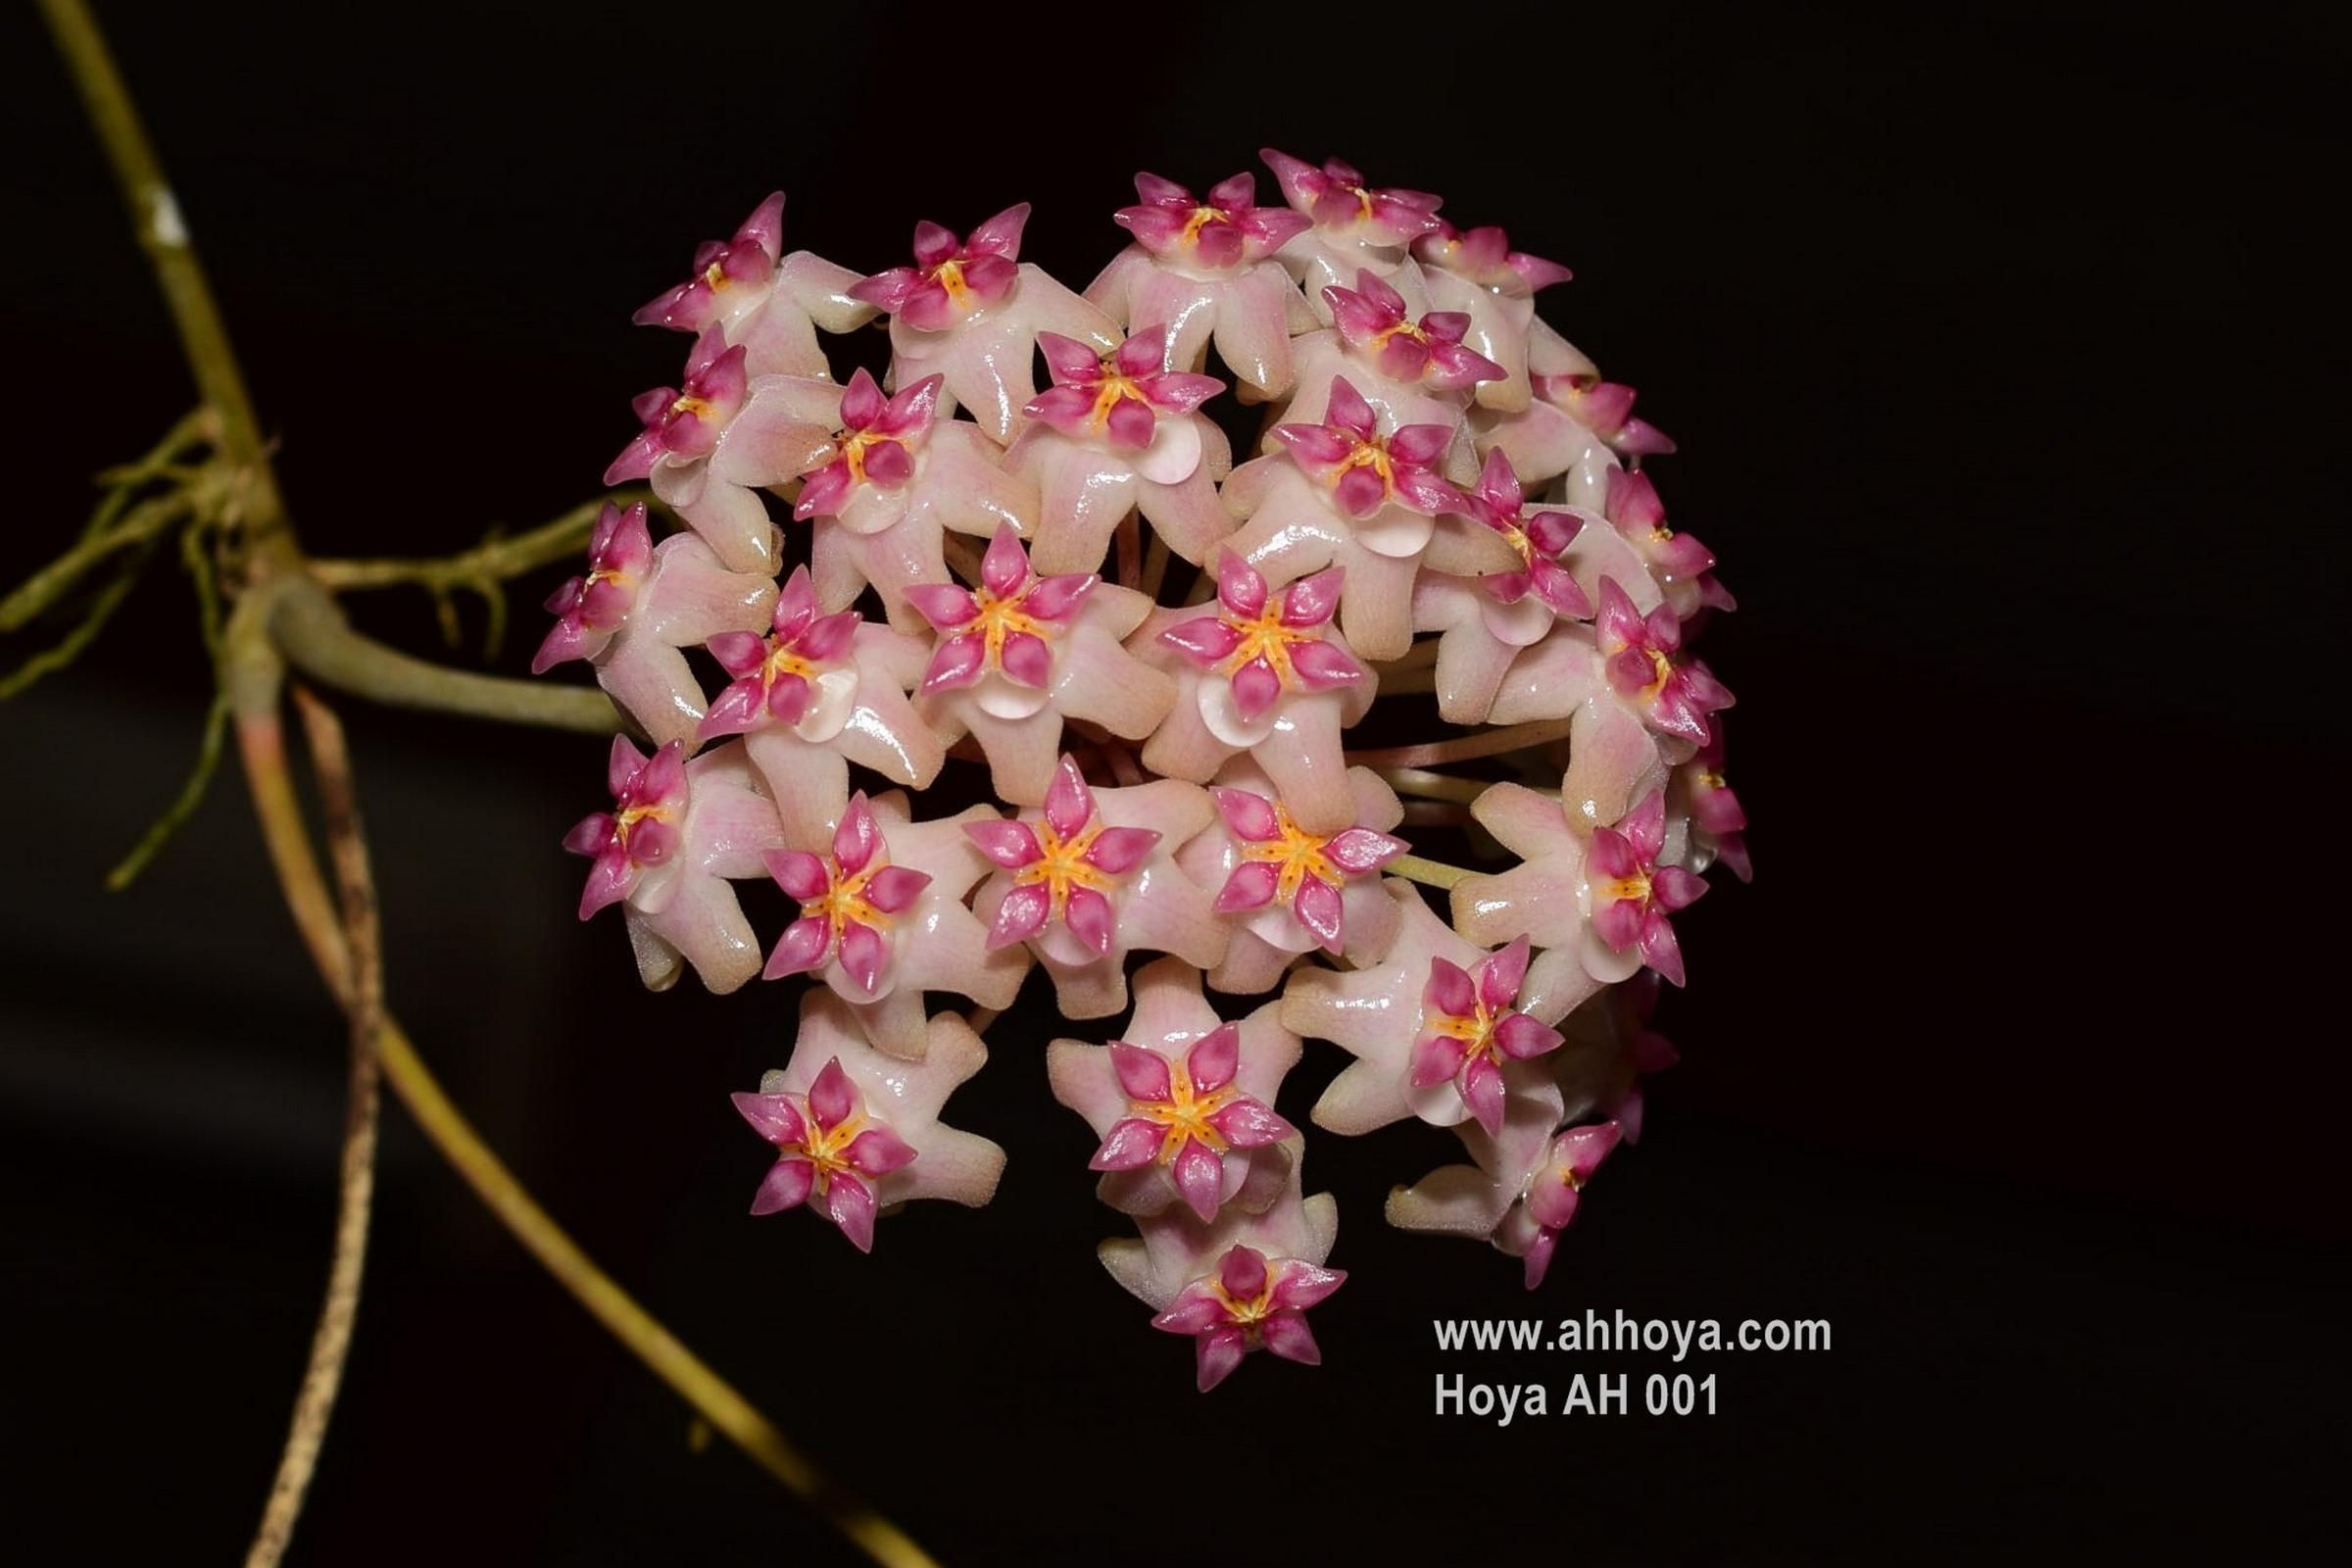 Hoya Plants Nursery Thailand Ah Suanlangbang Cutting สวนหล งบ าน ขายโฮย า ไม น ว